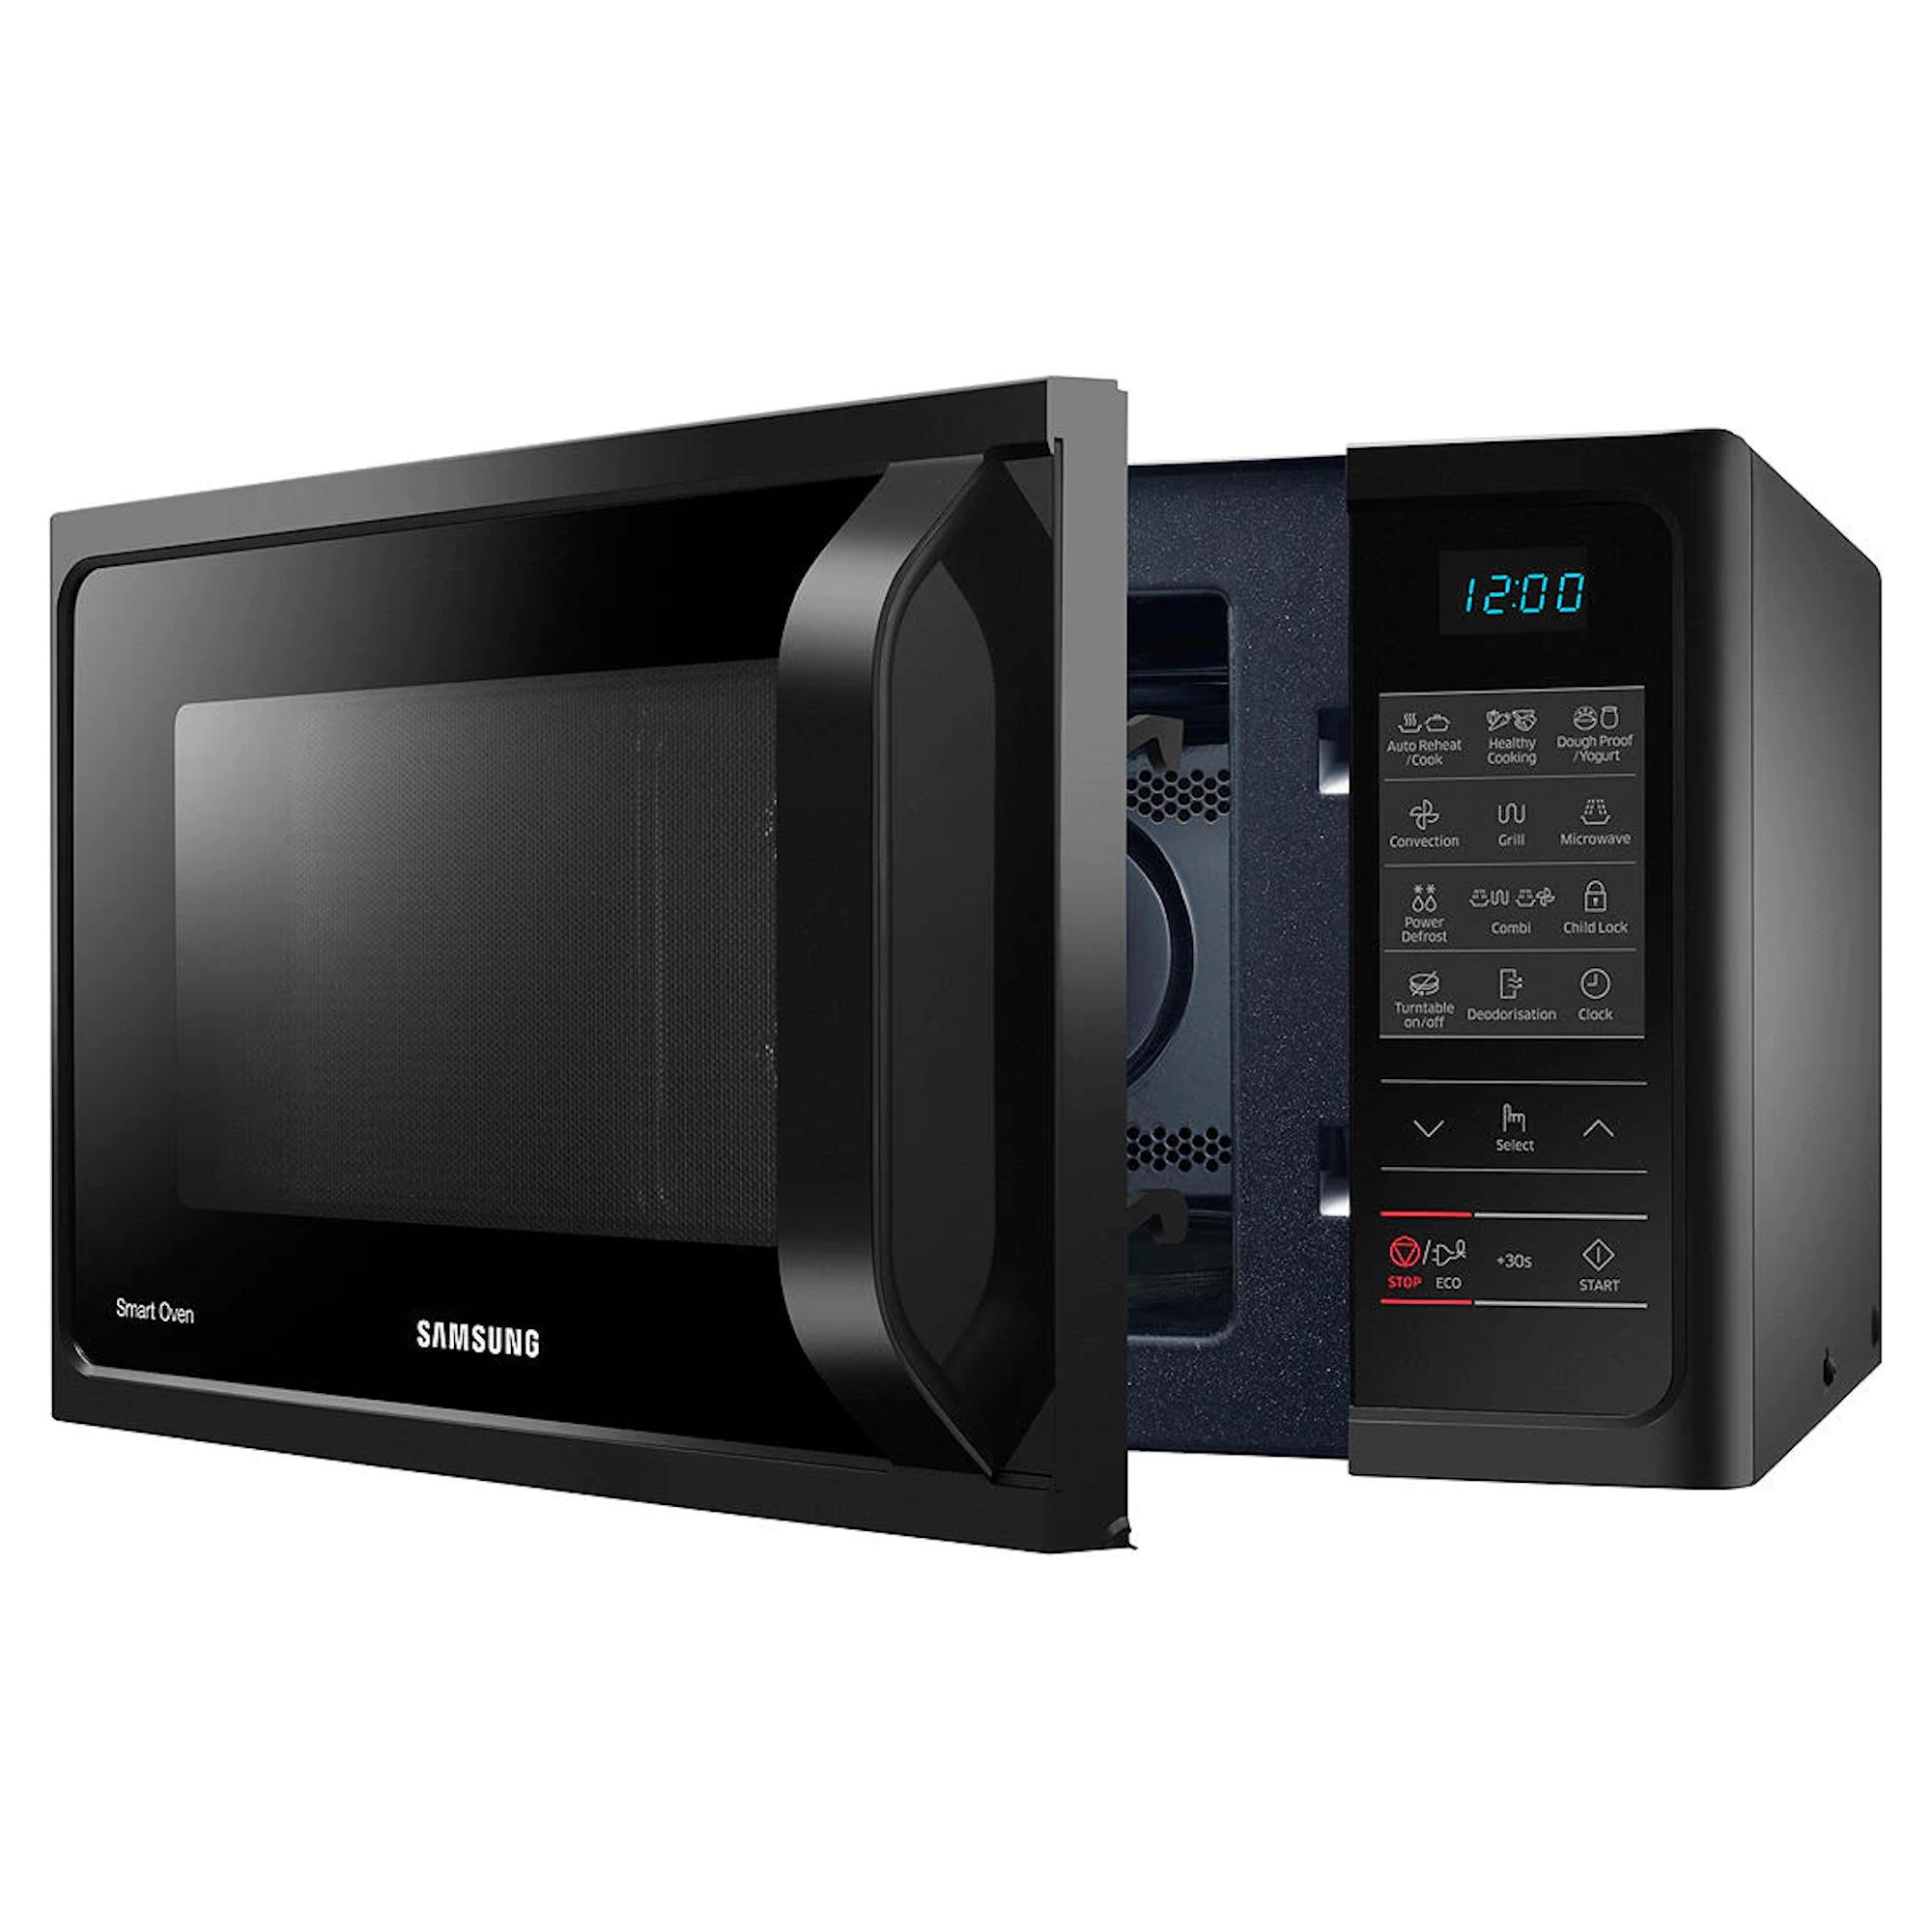 Samsung Mc28h5013ak 28l Combination Microwave Oven Hughes